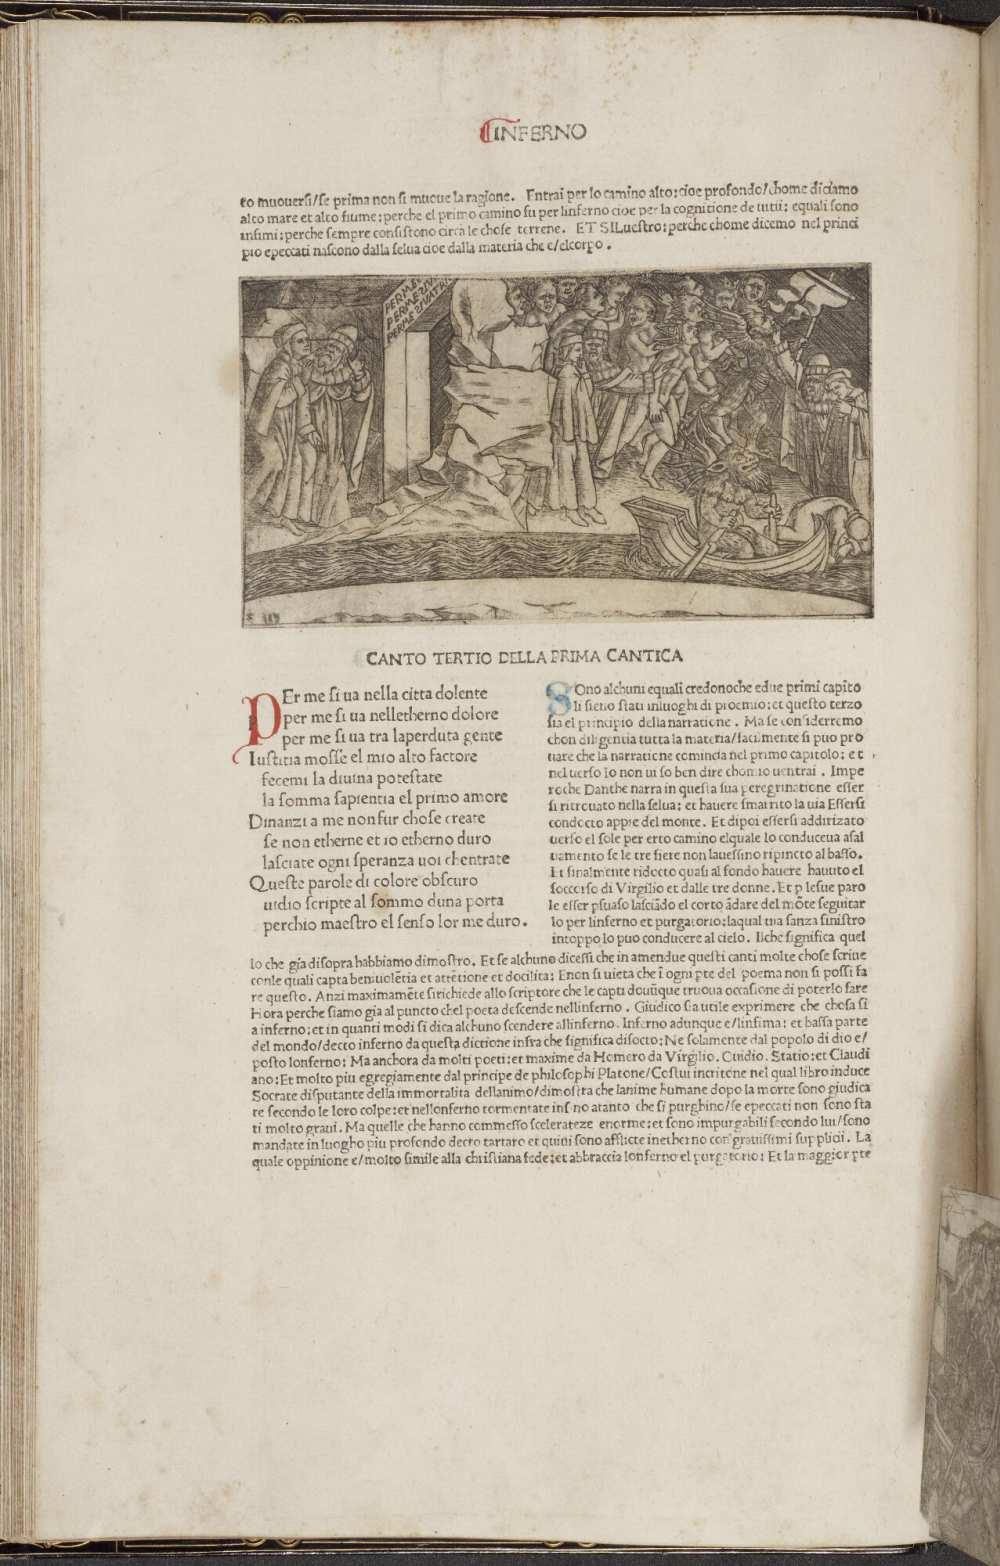 La Commedia (Comm. Cristophorus Landinus). (17280). A kép forrása: University of Manchester, Digital Collection. https://www.digitalcollections.manchester.ac.uk/view/PR-INCU-17280/68